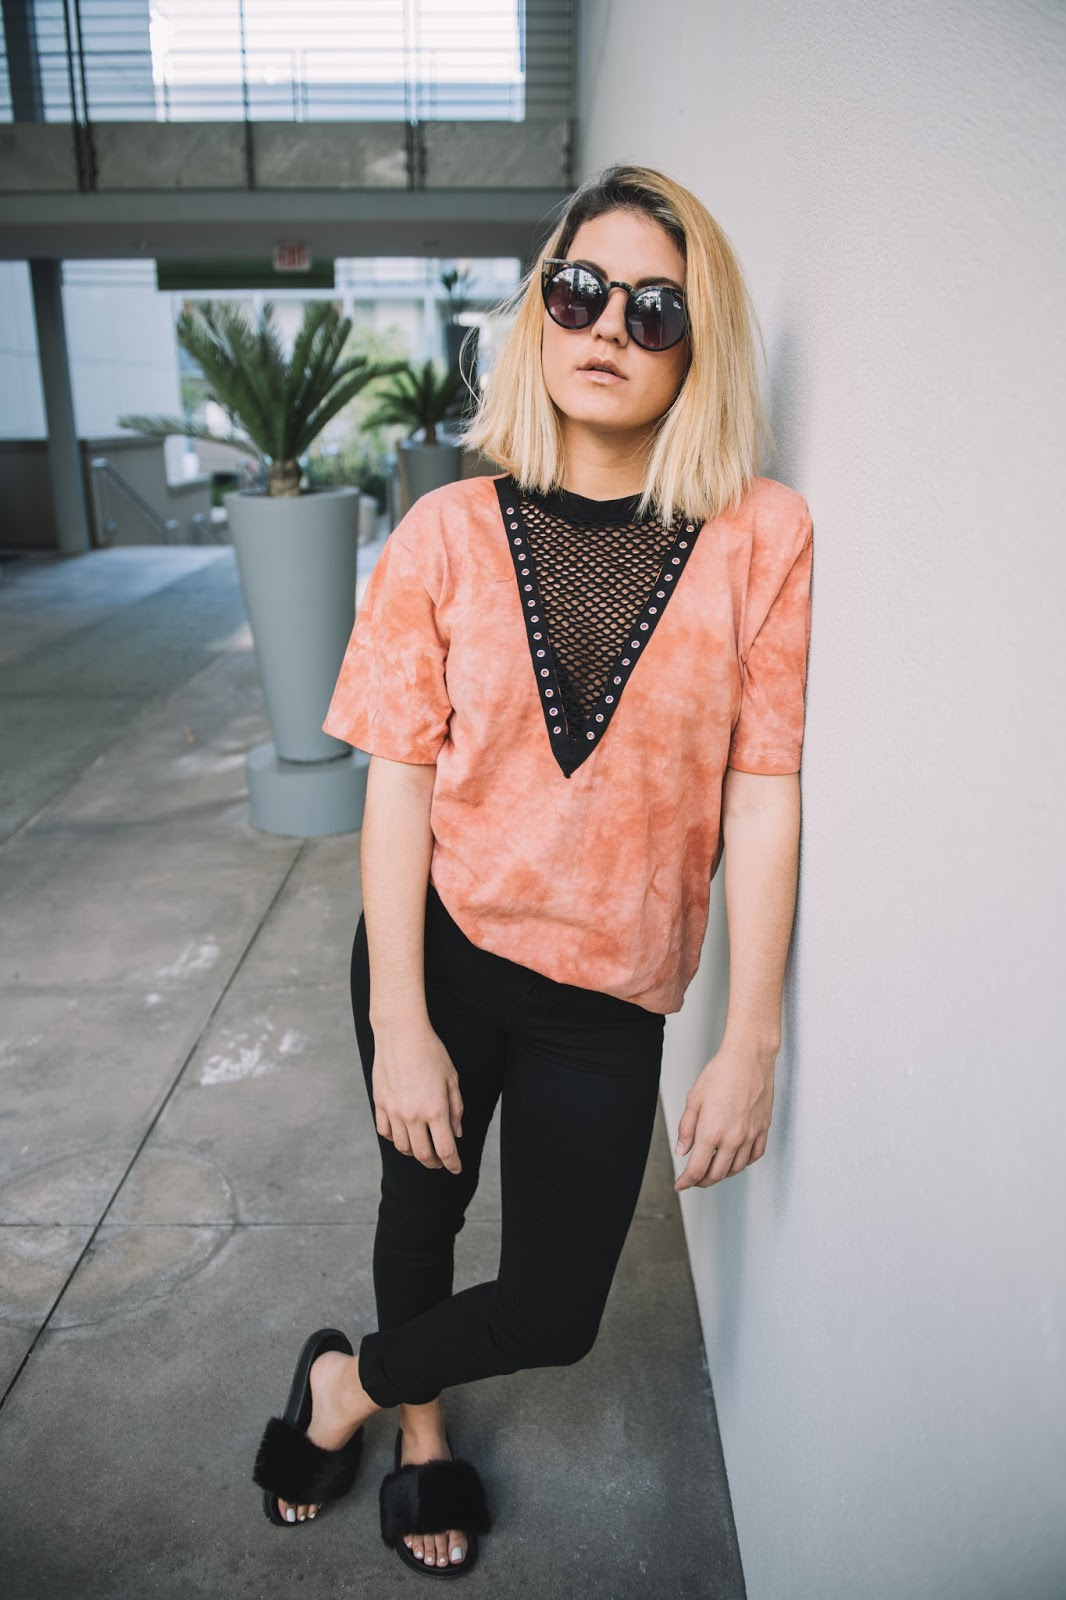 LA Fashion Blogger -- @ taylorwinkelmeyer